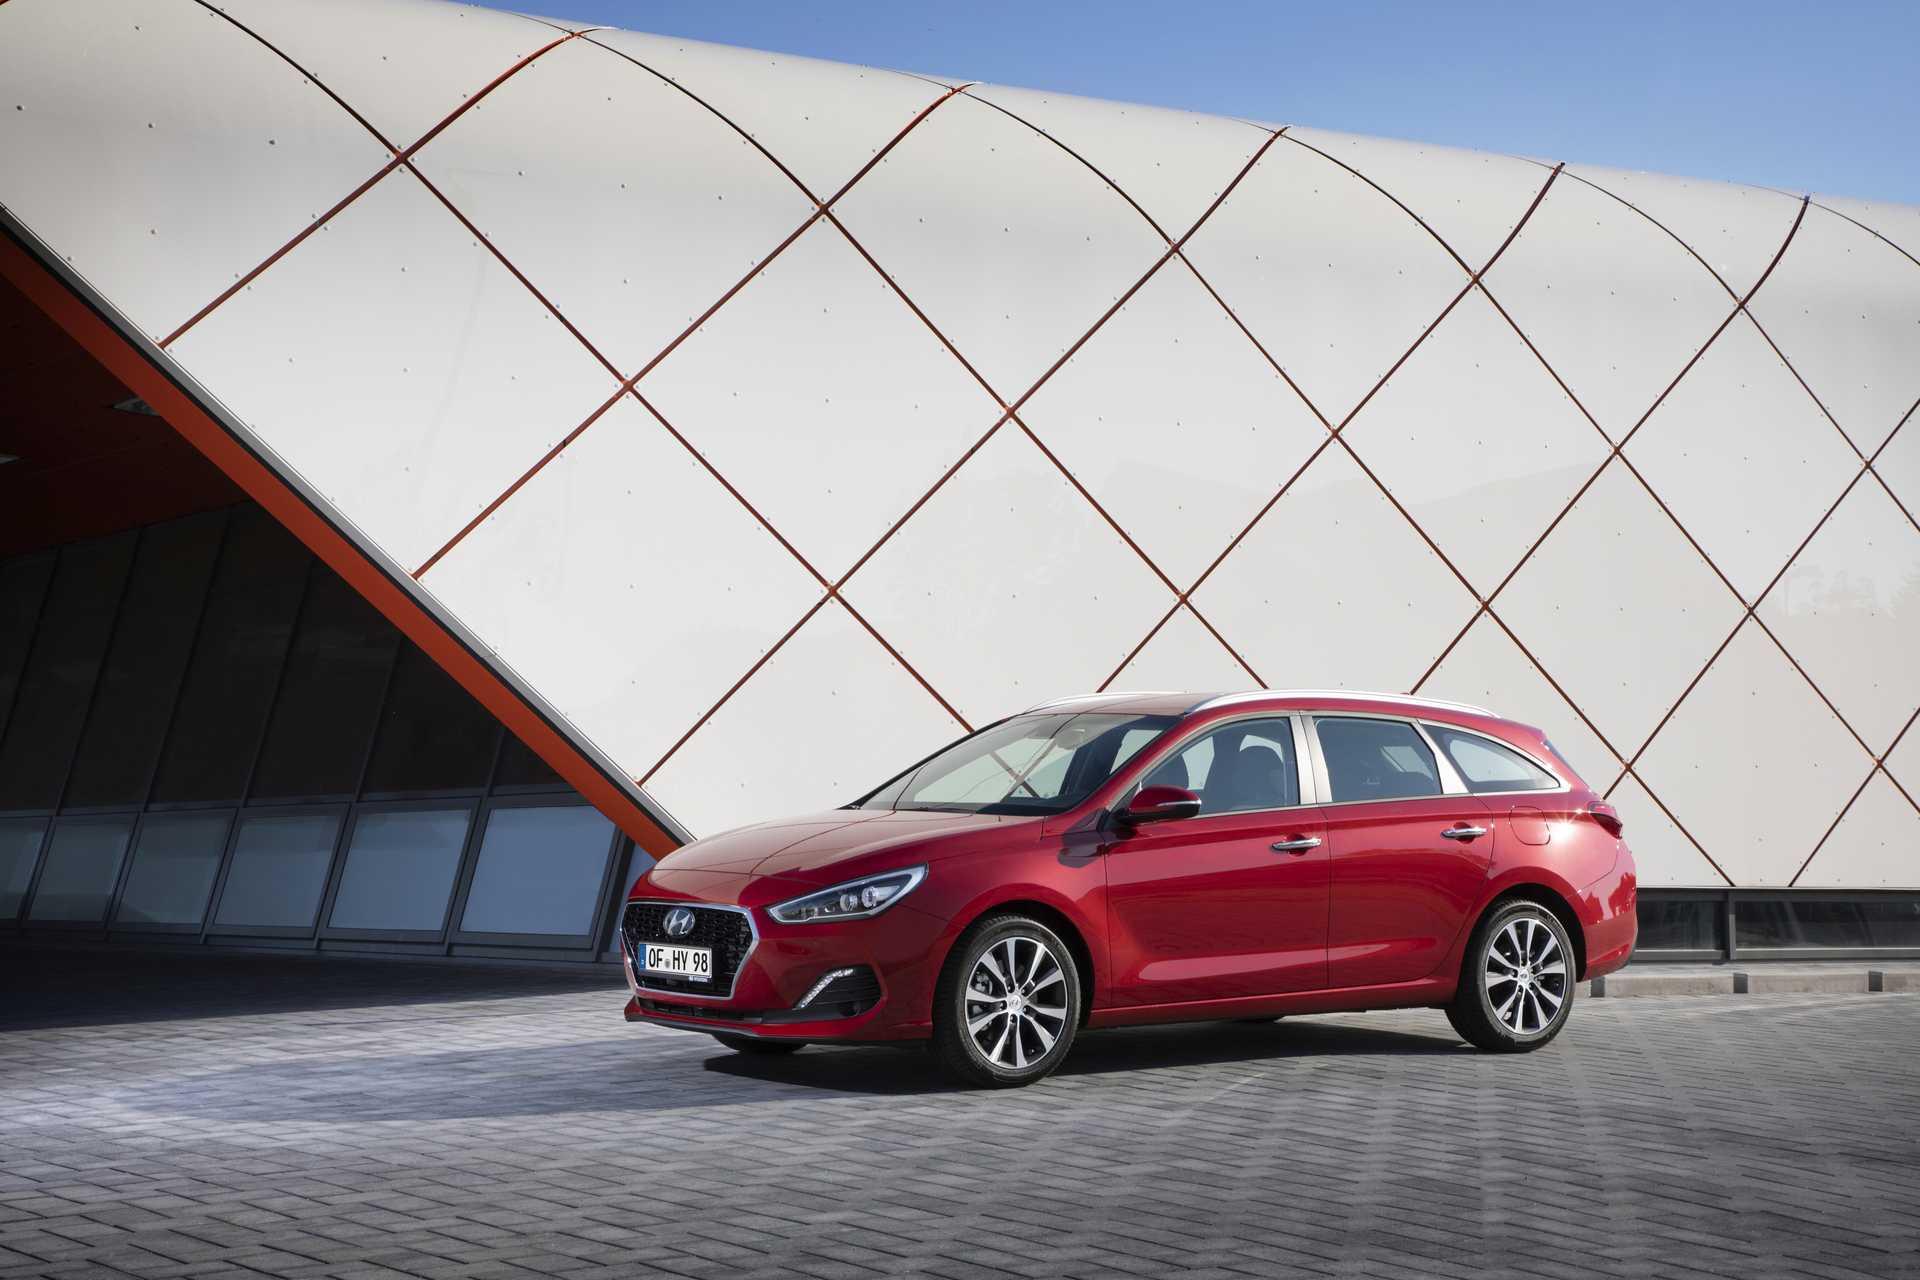 Hyundai i30cw 2019